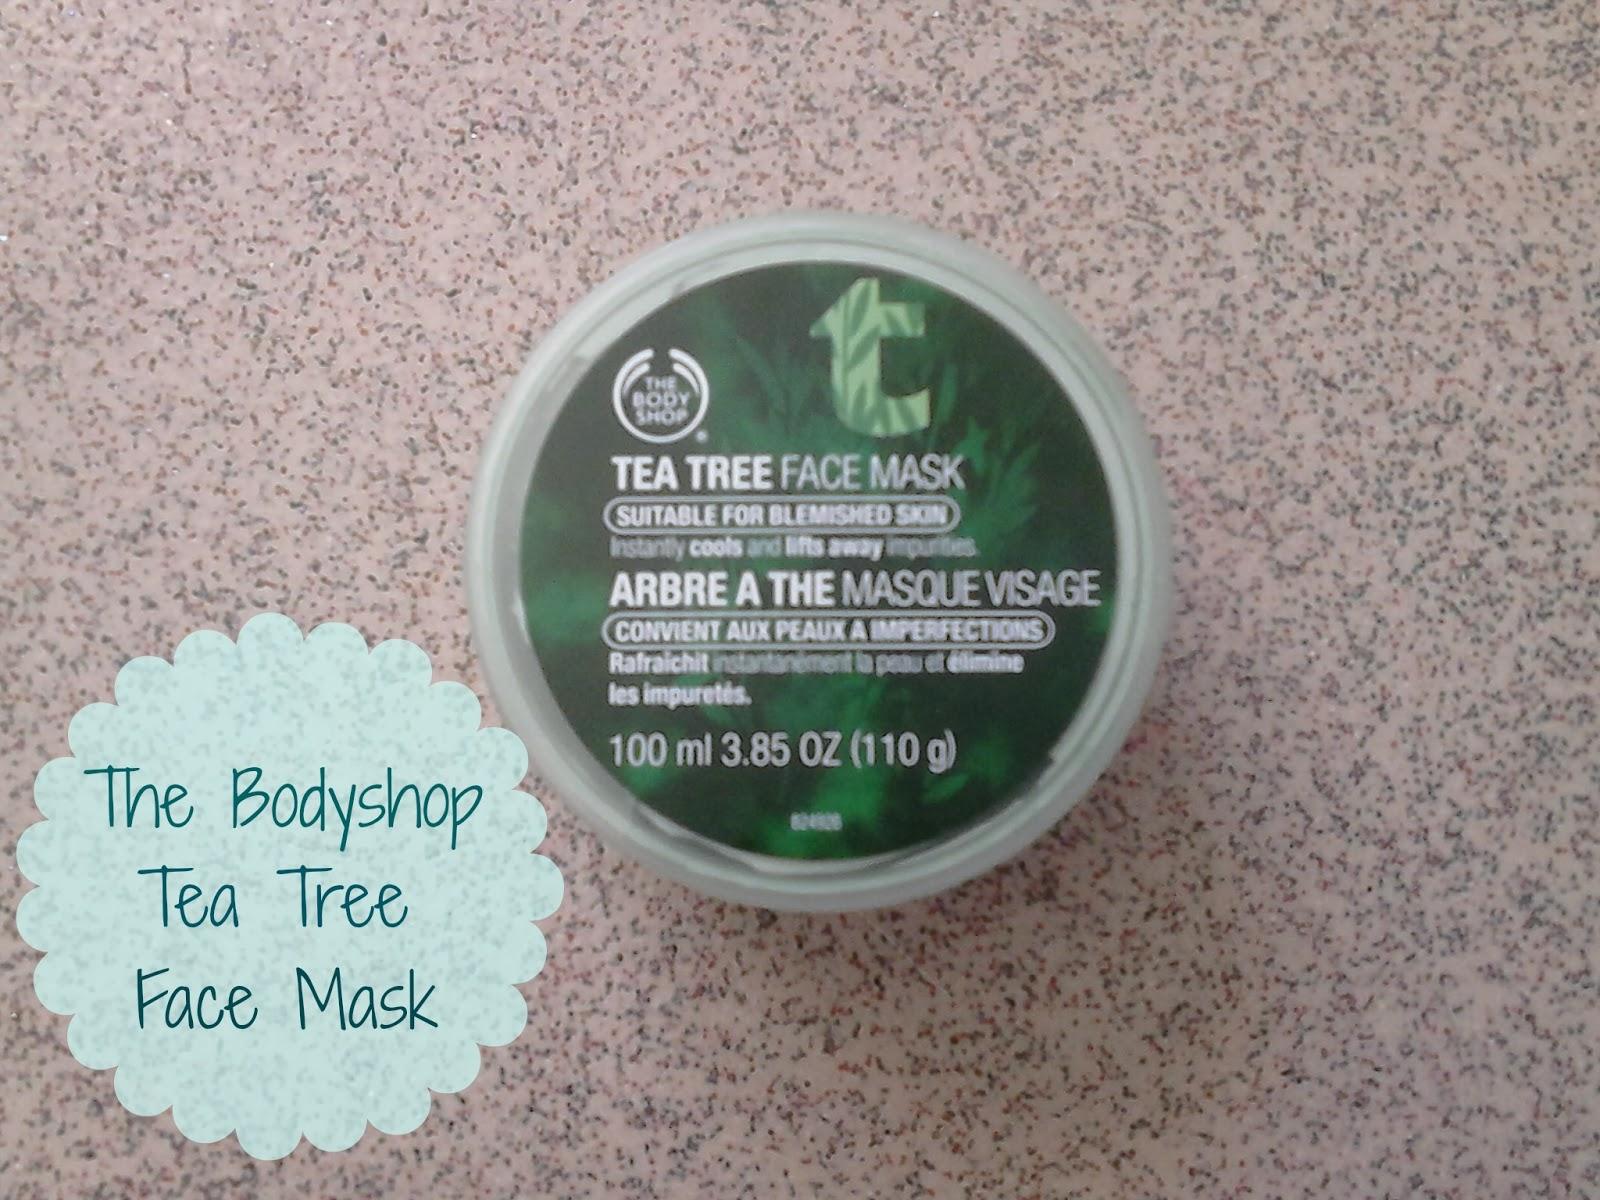 The Bodyshop Tea Tree Face Mask